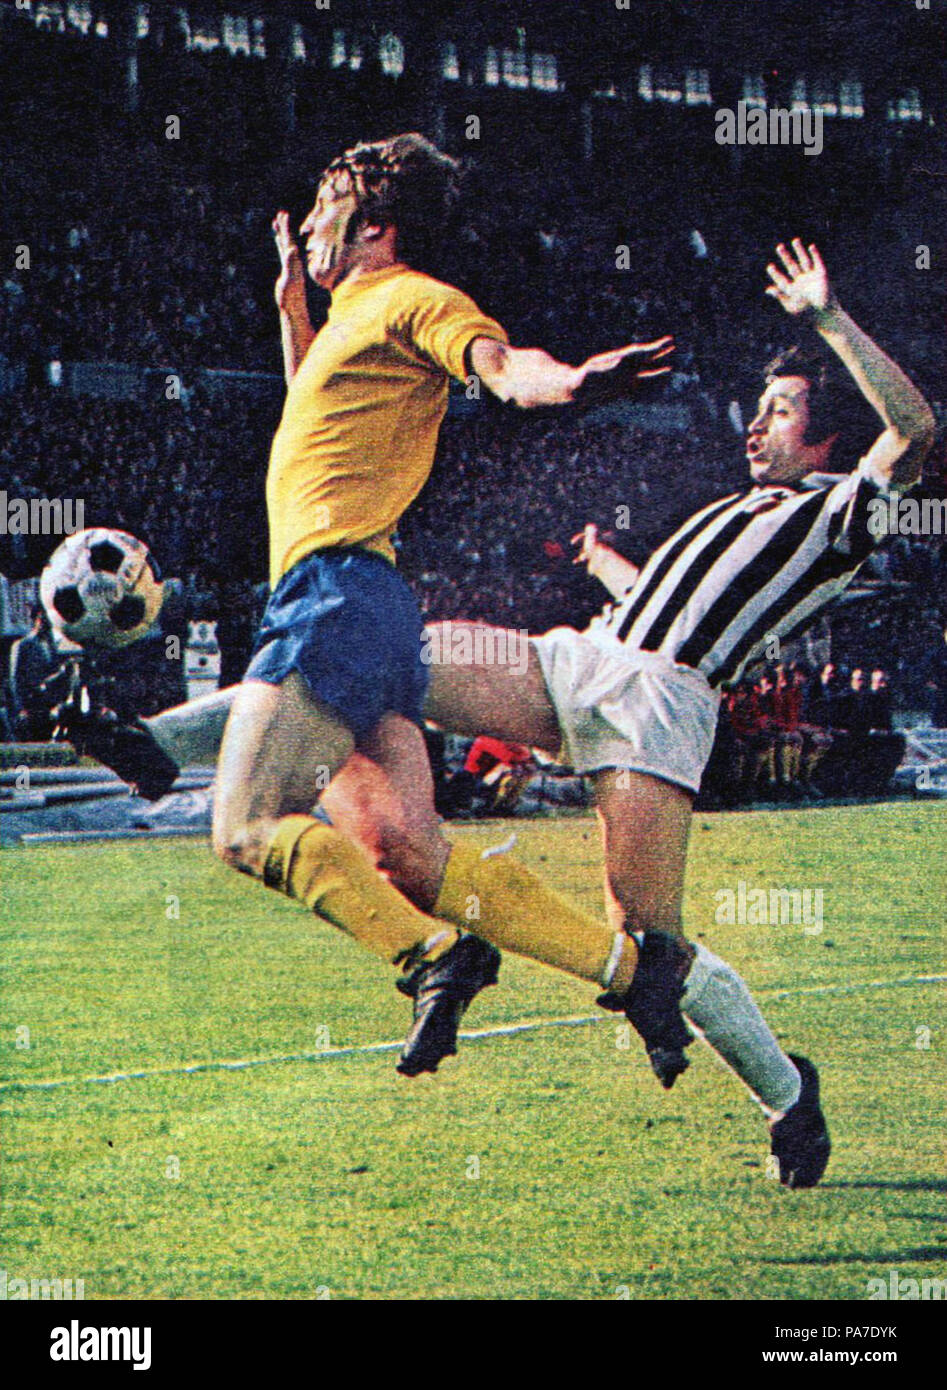 77 European Cup 1972-73 - Juventus v Derby County - John McGovern & Franco Causio Stock Photo